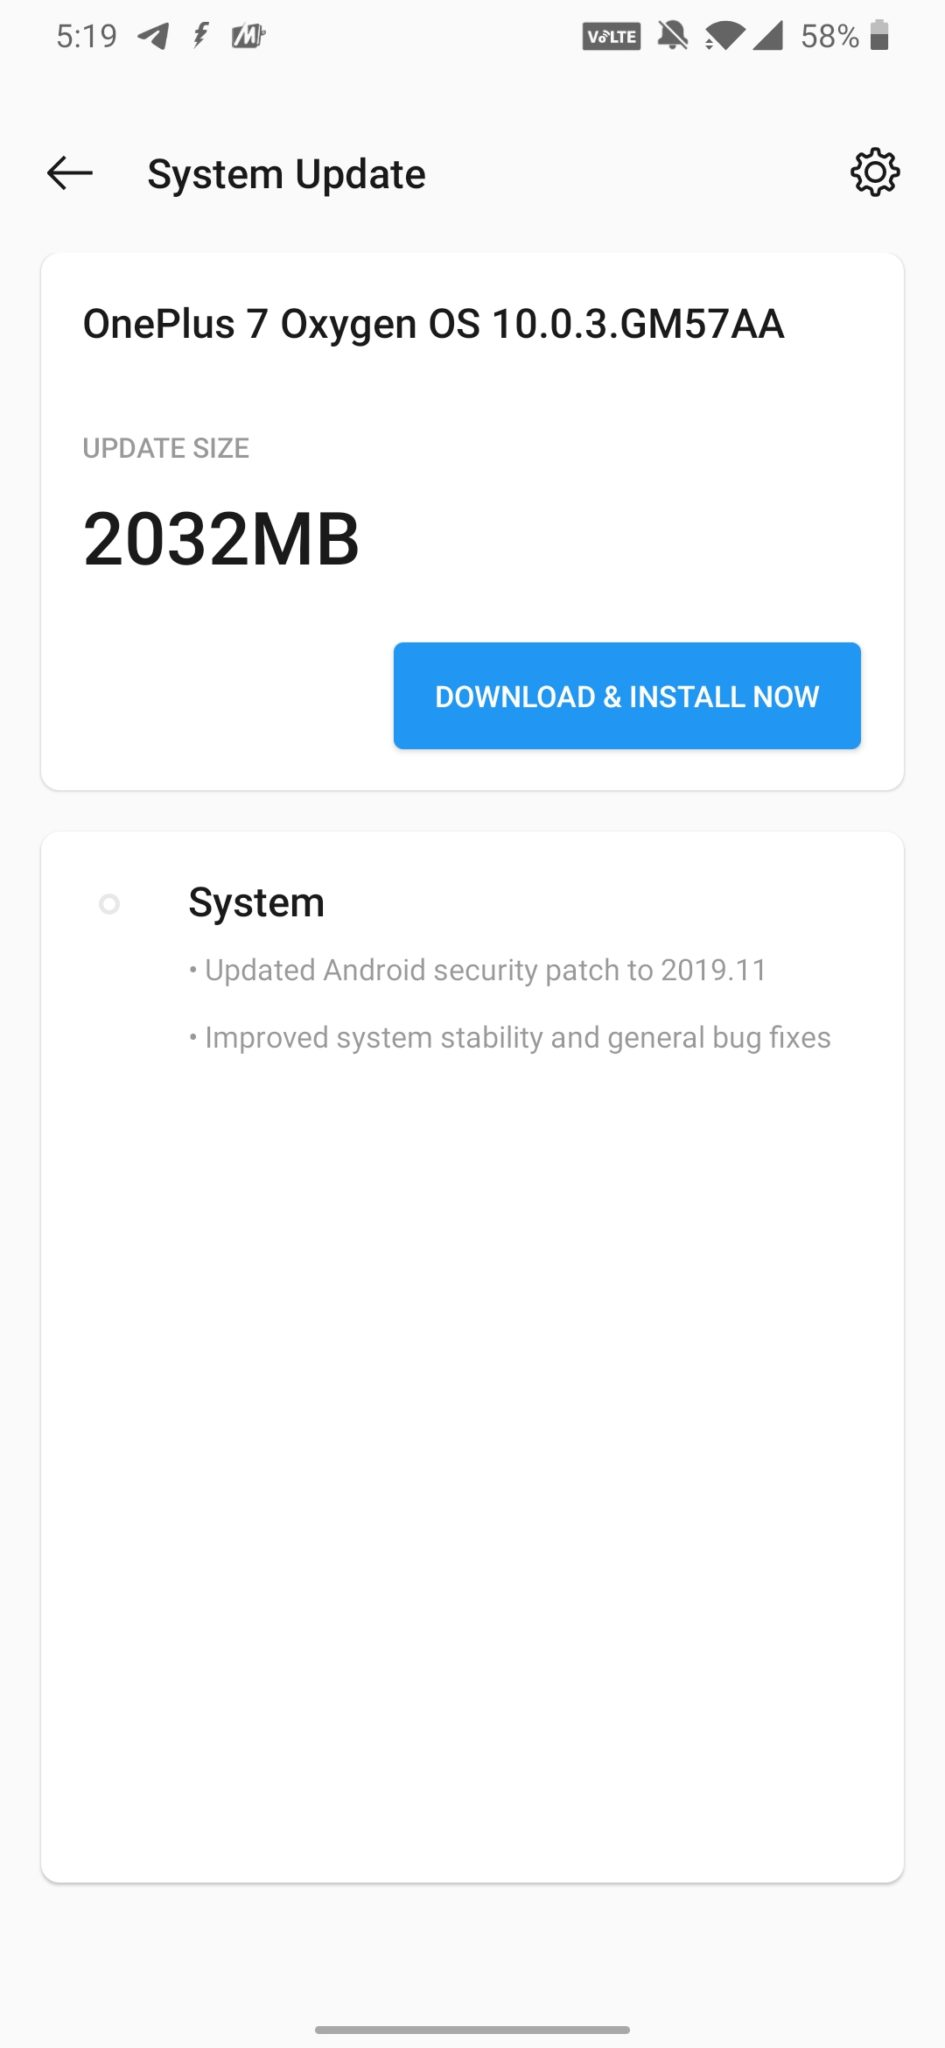 OnePlus 7-OnePlus 7